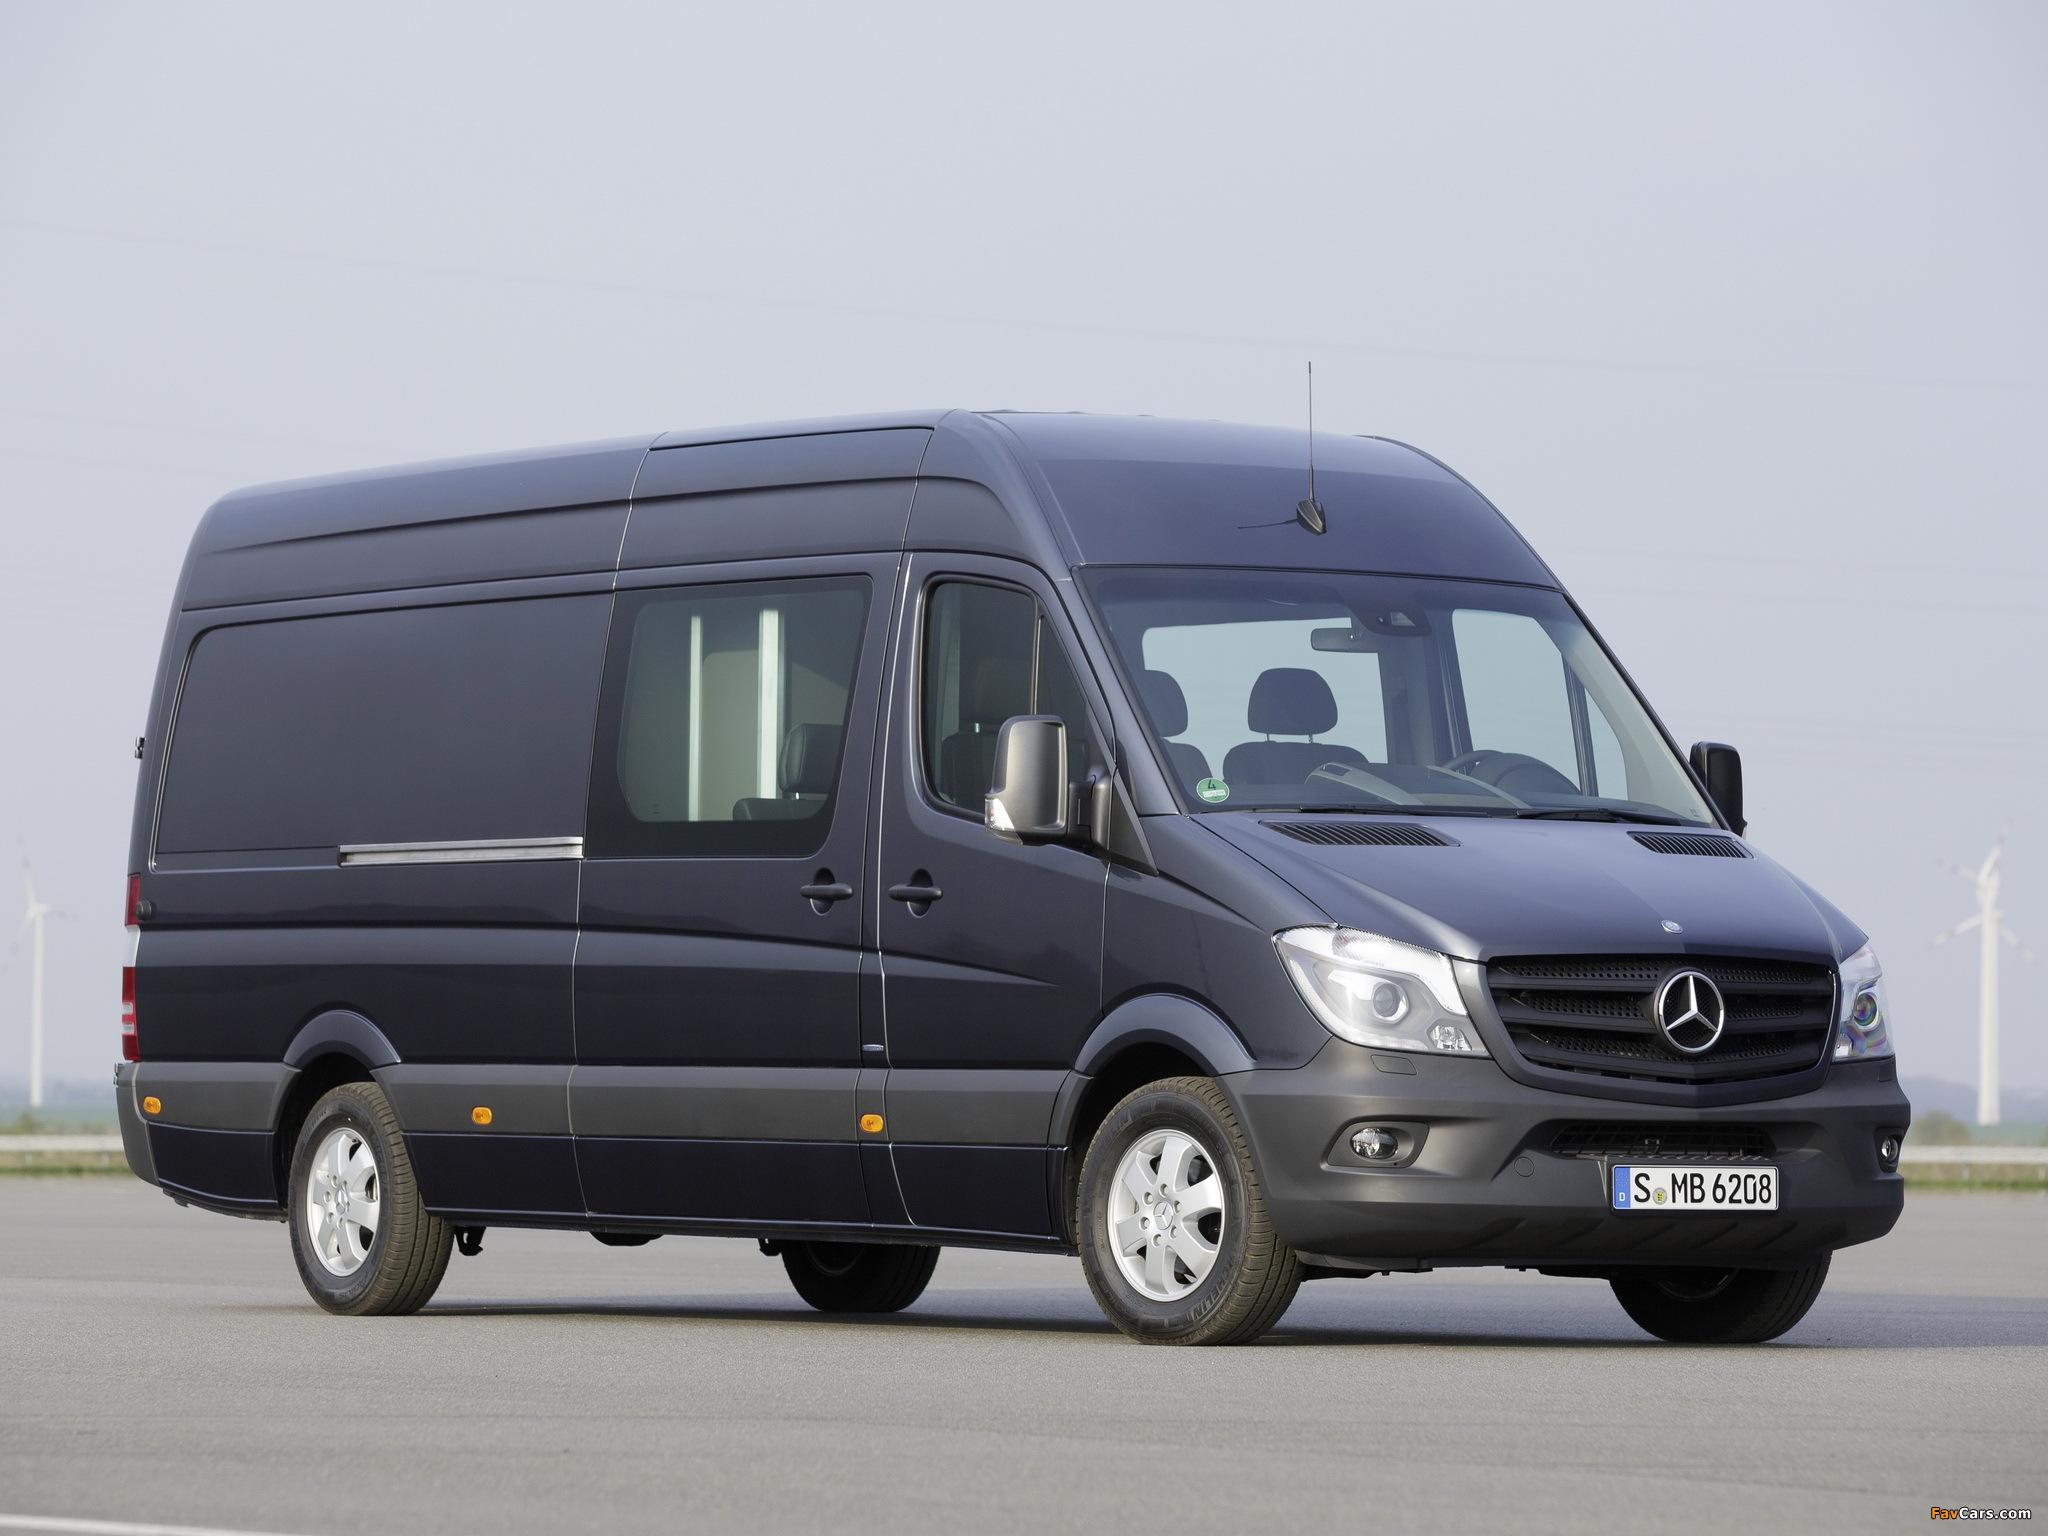 Mercedes-Benz Sprinter LWB High Roof Van (W906) 2013 images (2048 x 1536)